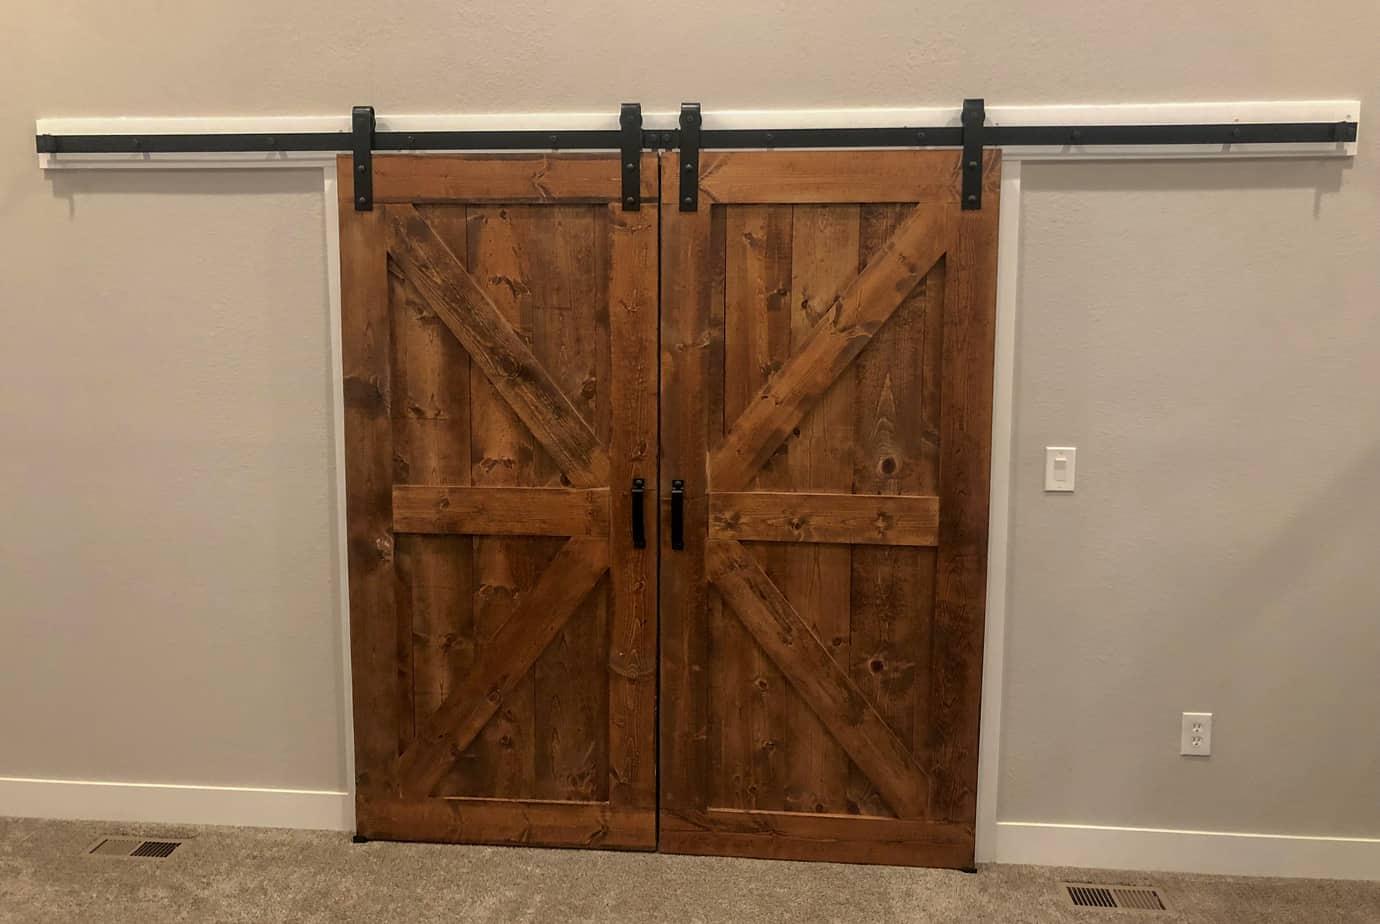 British brace style sliding doors with black barn door hardware